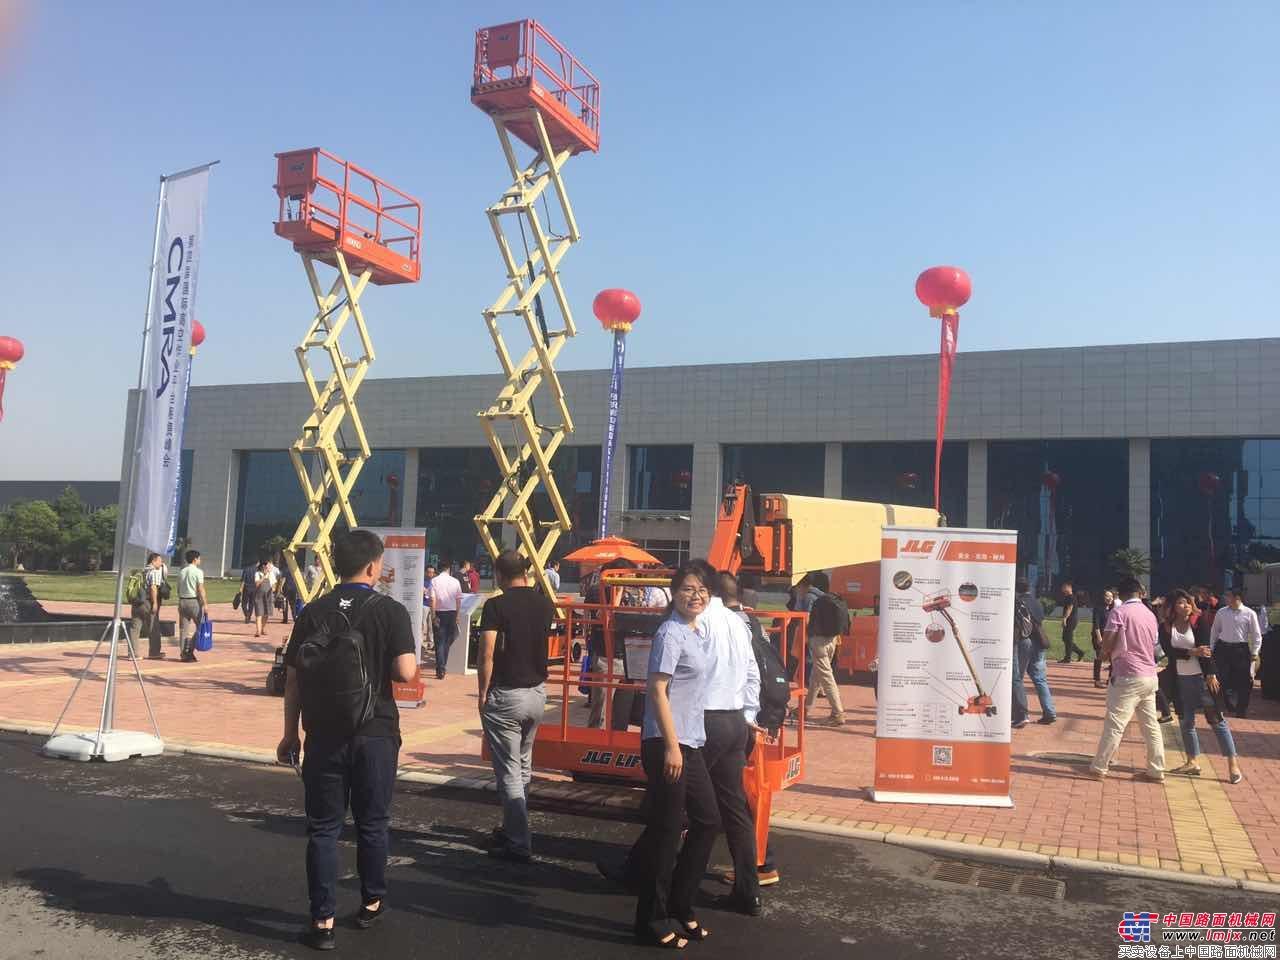 JLG(捷尔杰)携两款新星产品亮相第四届国际高空作业平台租赁